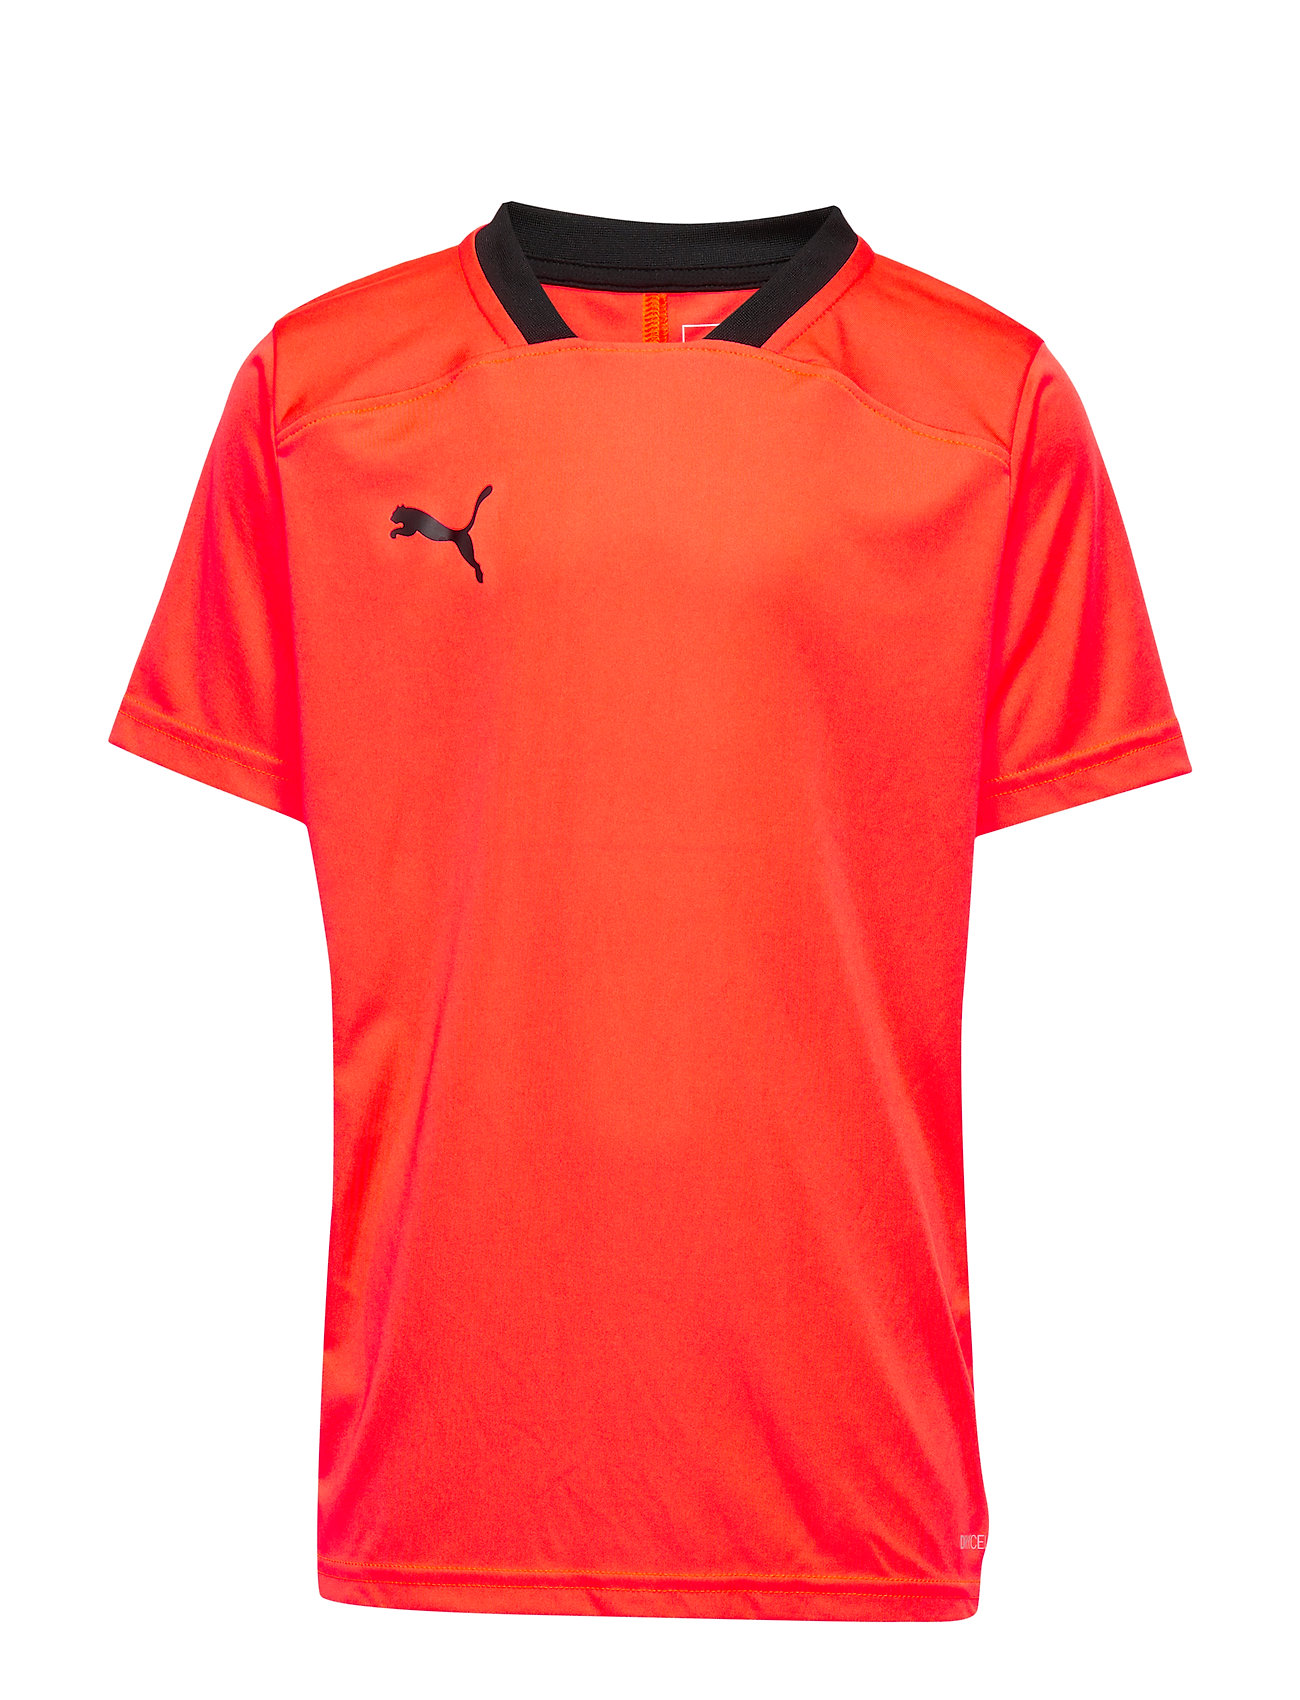 PUMA ftblNXT Shirt Jr - NRGY RED-PUMA BLACK